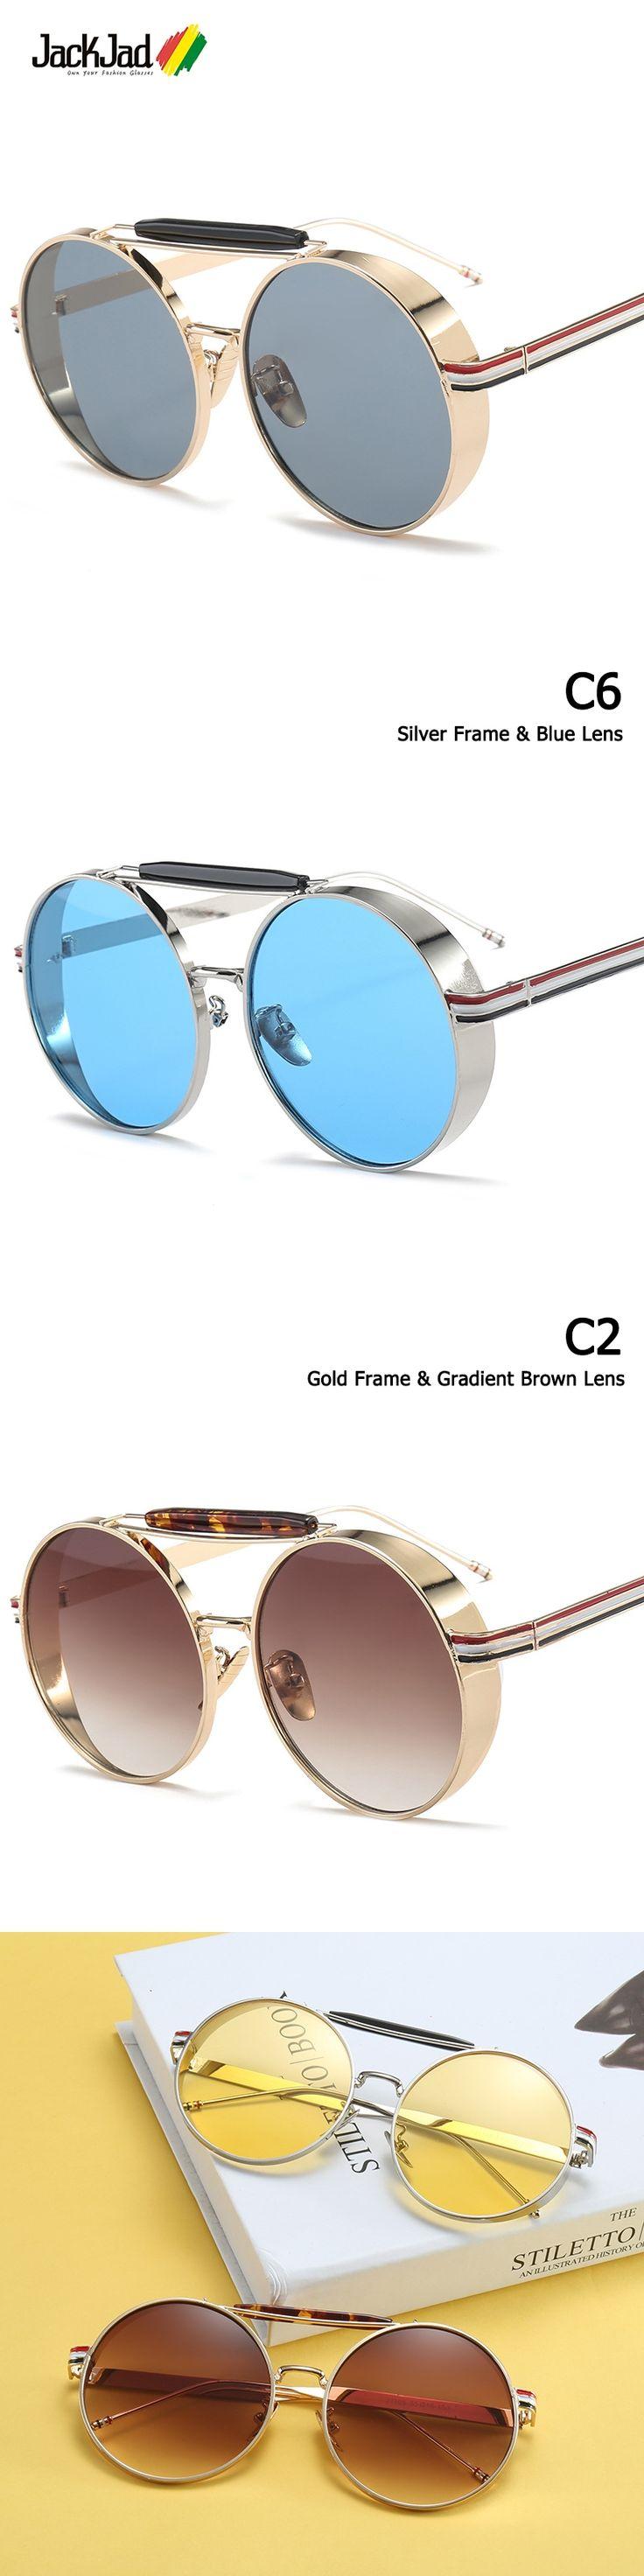 JackJad New Fashion Thick Side Metal Frame Round Style Sunglasses Vintage Classic Brand Design Sun Glasses Oculos De Sol S105